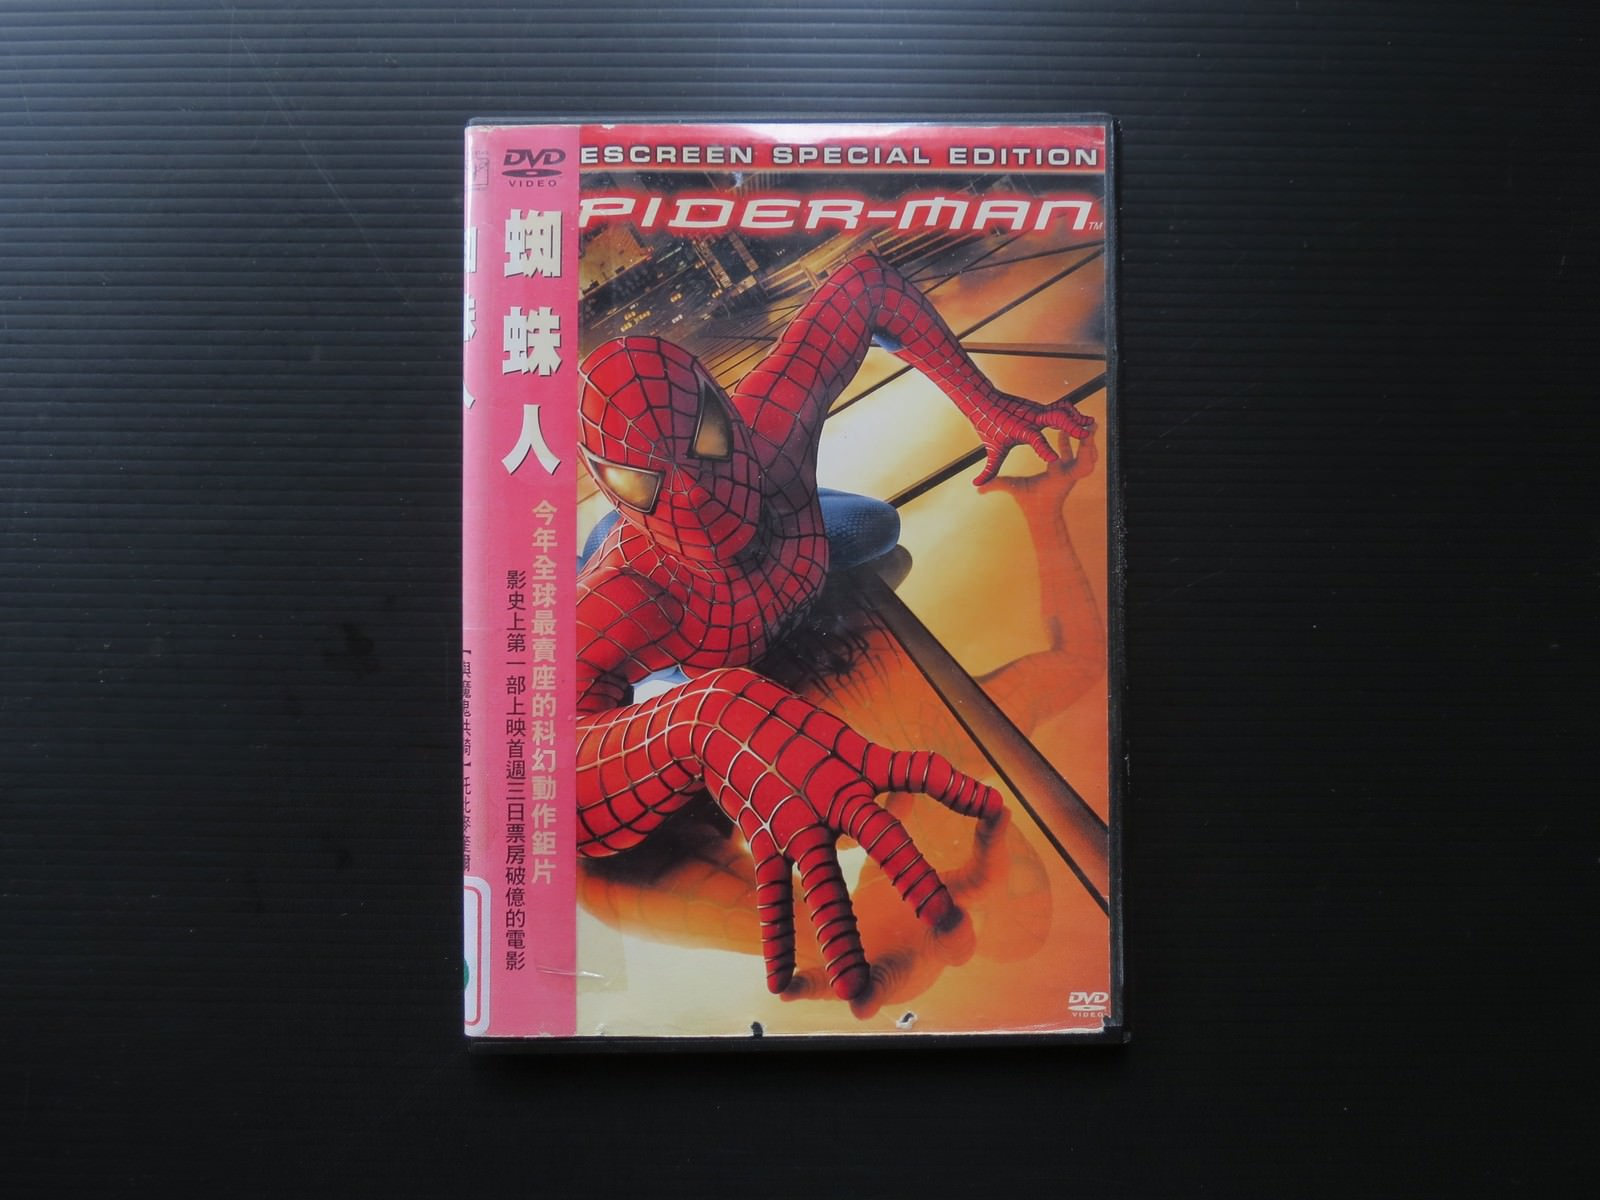 Movie, Spider-Man(美國, 2002年) / 蜘蛛人(台灣) / 蜘蛛侠(中國) / 蜘蛛俠(香港), 電影DVD